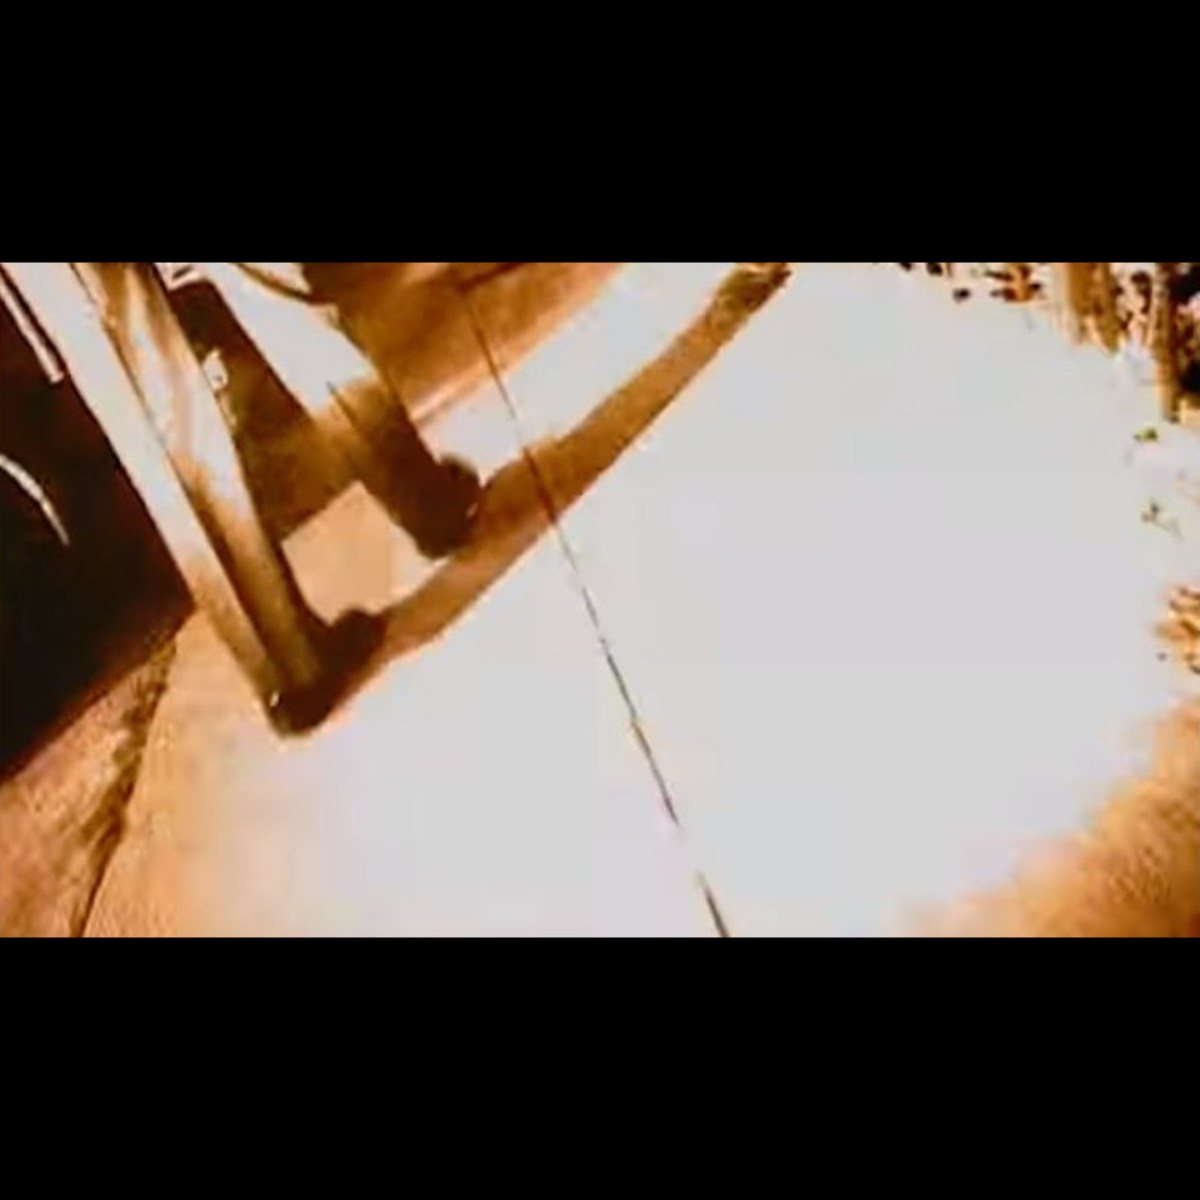 2Pac - Holler If Ya Hear Me (Thumbnail)